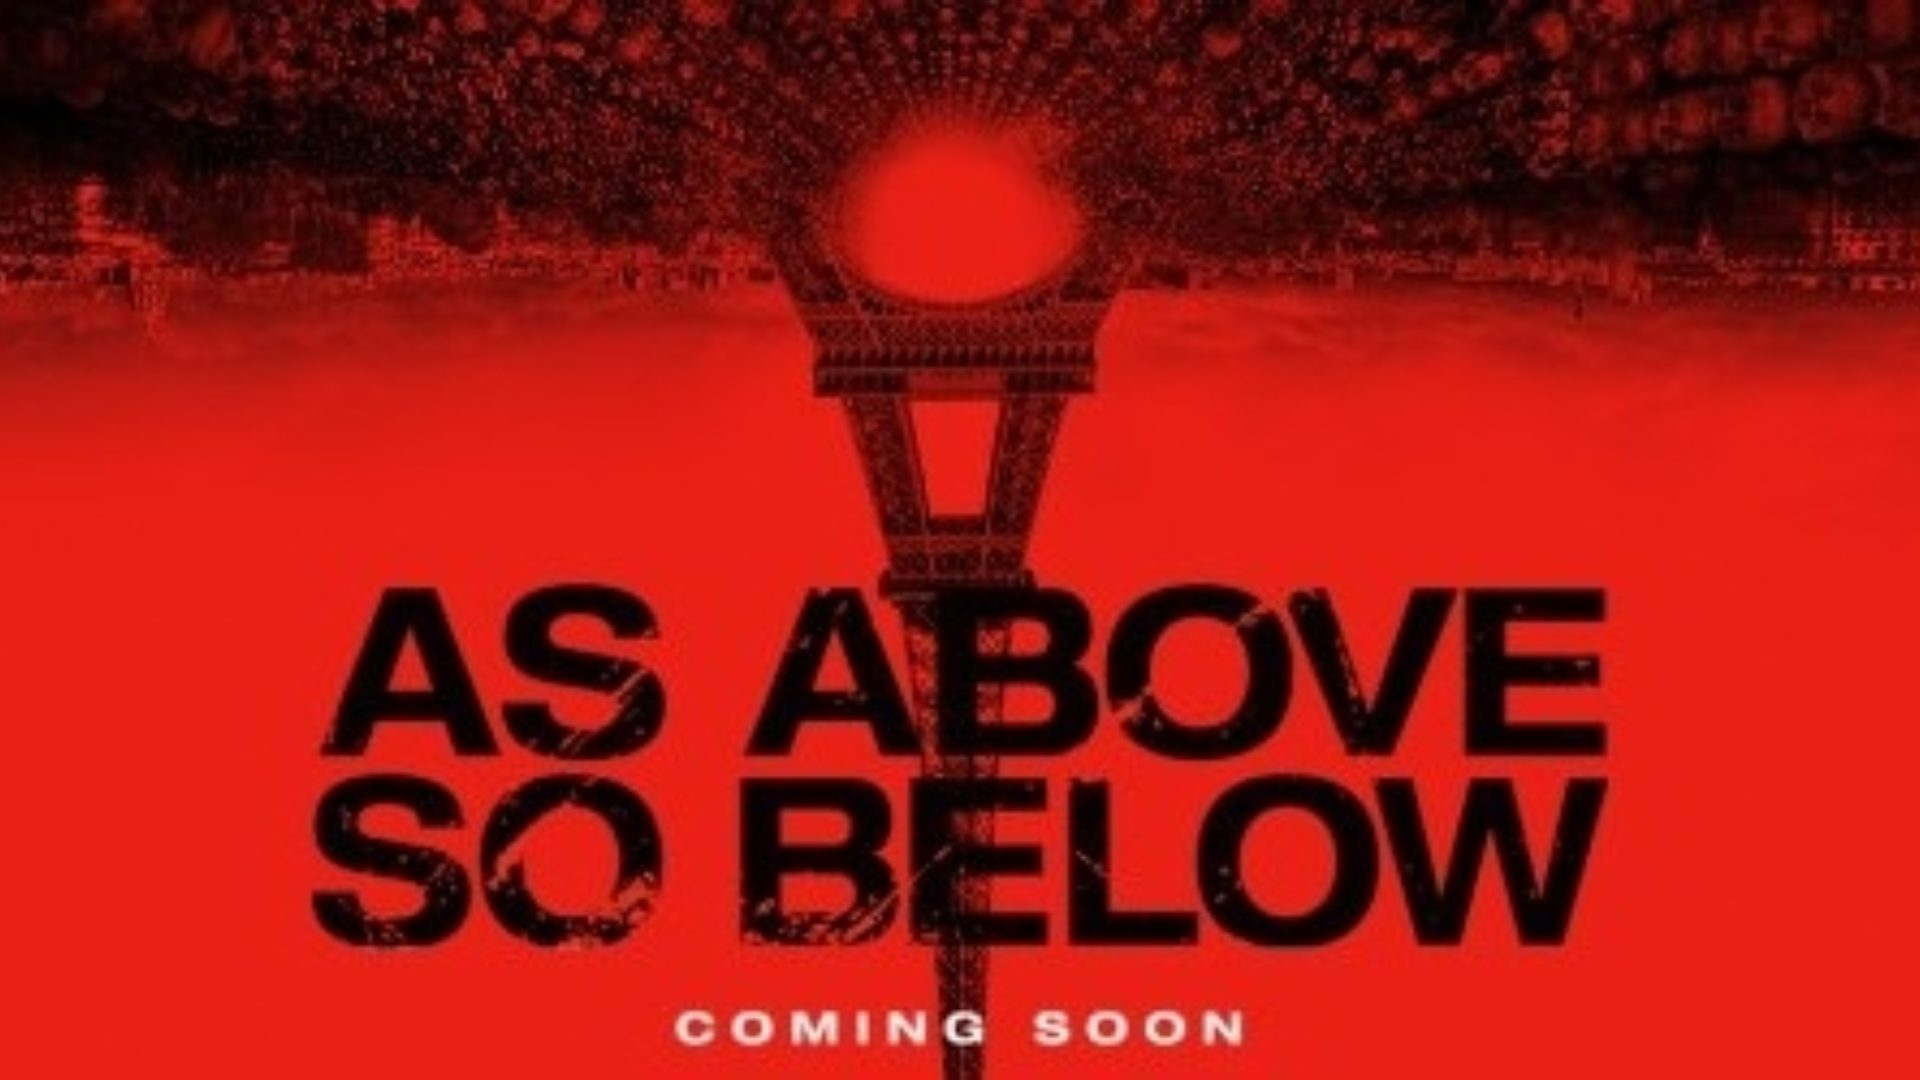 Fancy A Fright As Above So Below Movie Blipp Reveals Terrifying